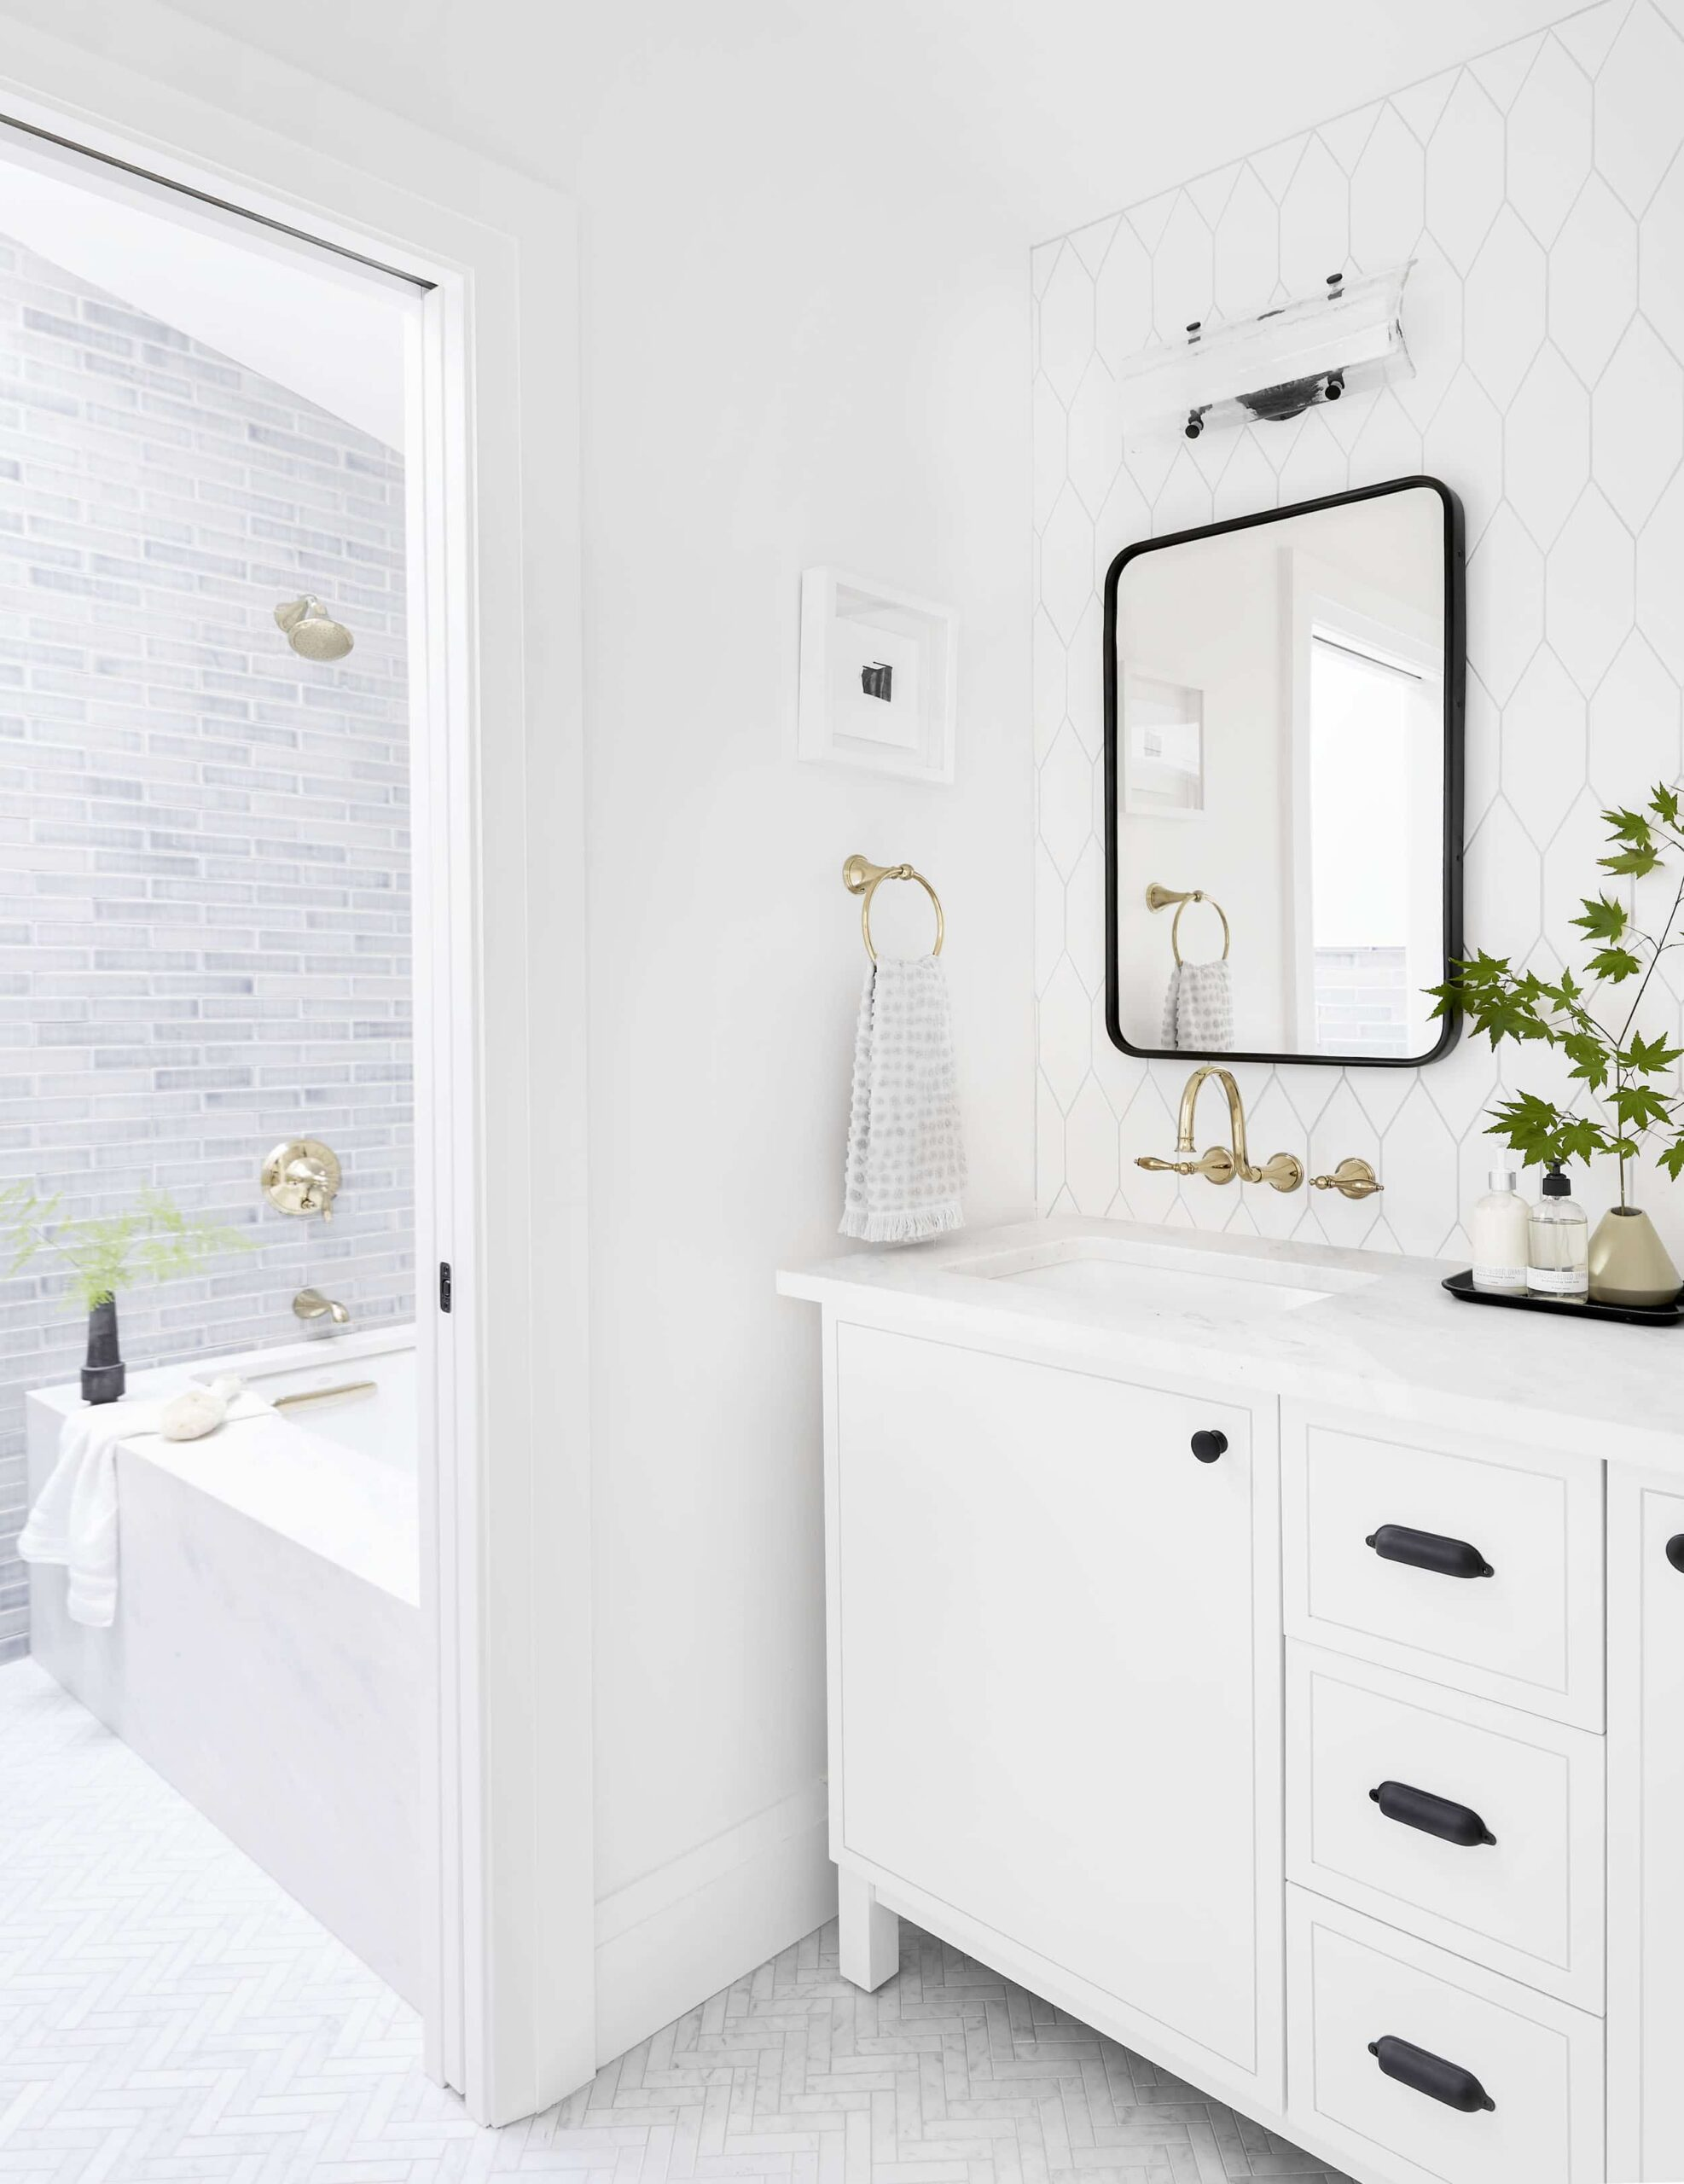 Before Picking Tile For Your Bathroom, Bathroom Vanity Portland Oregon